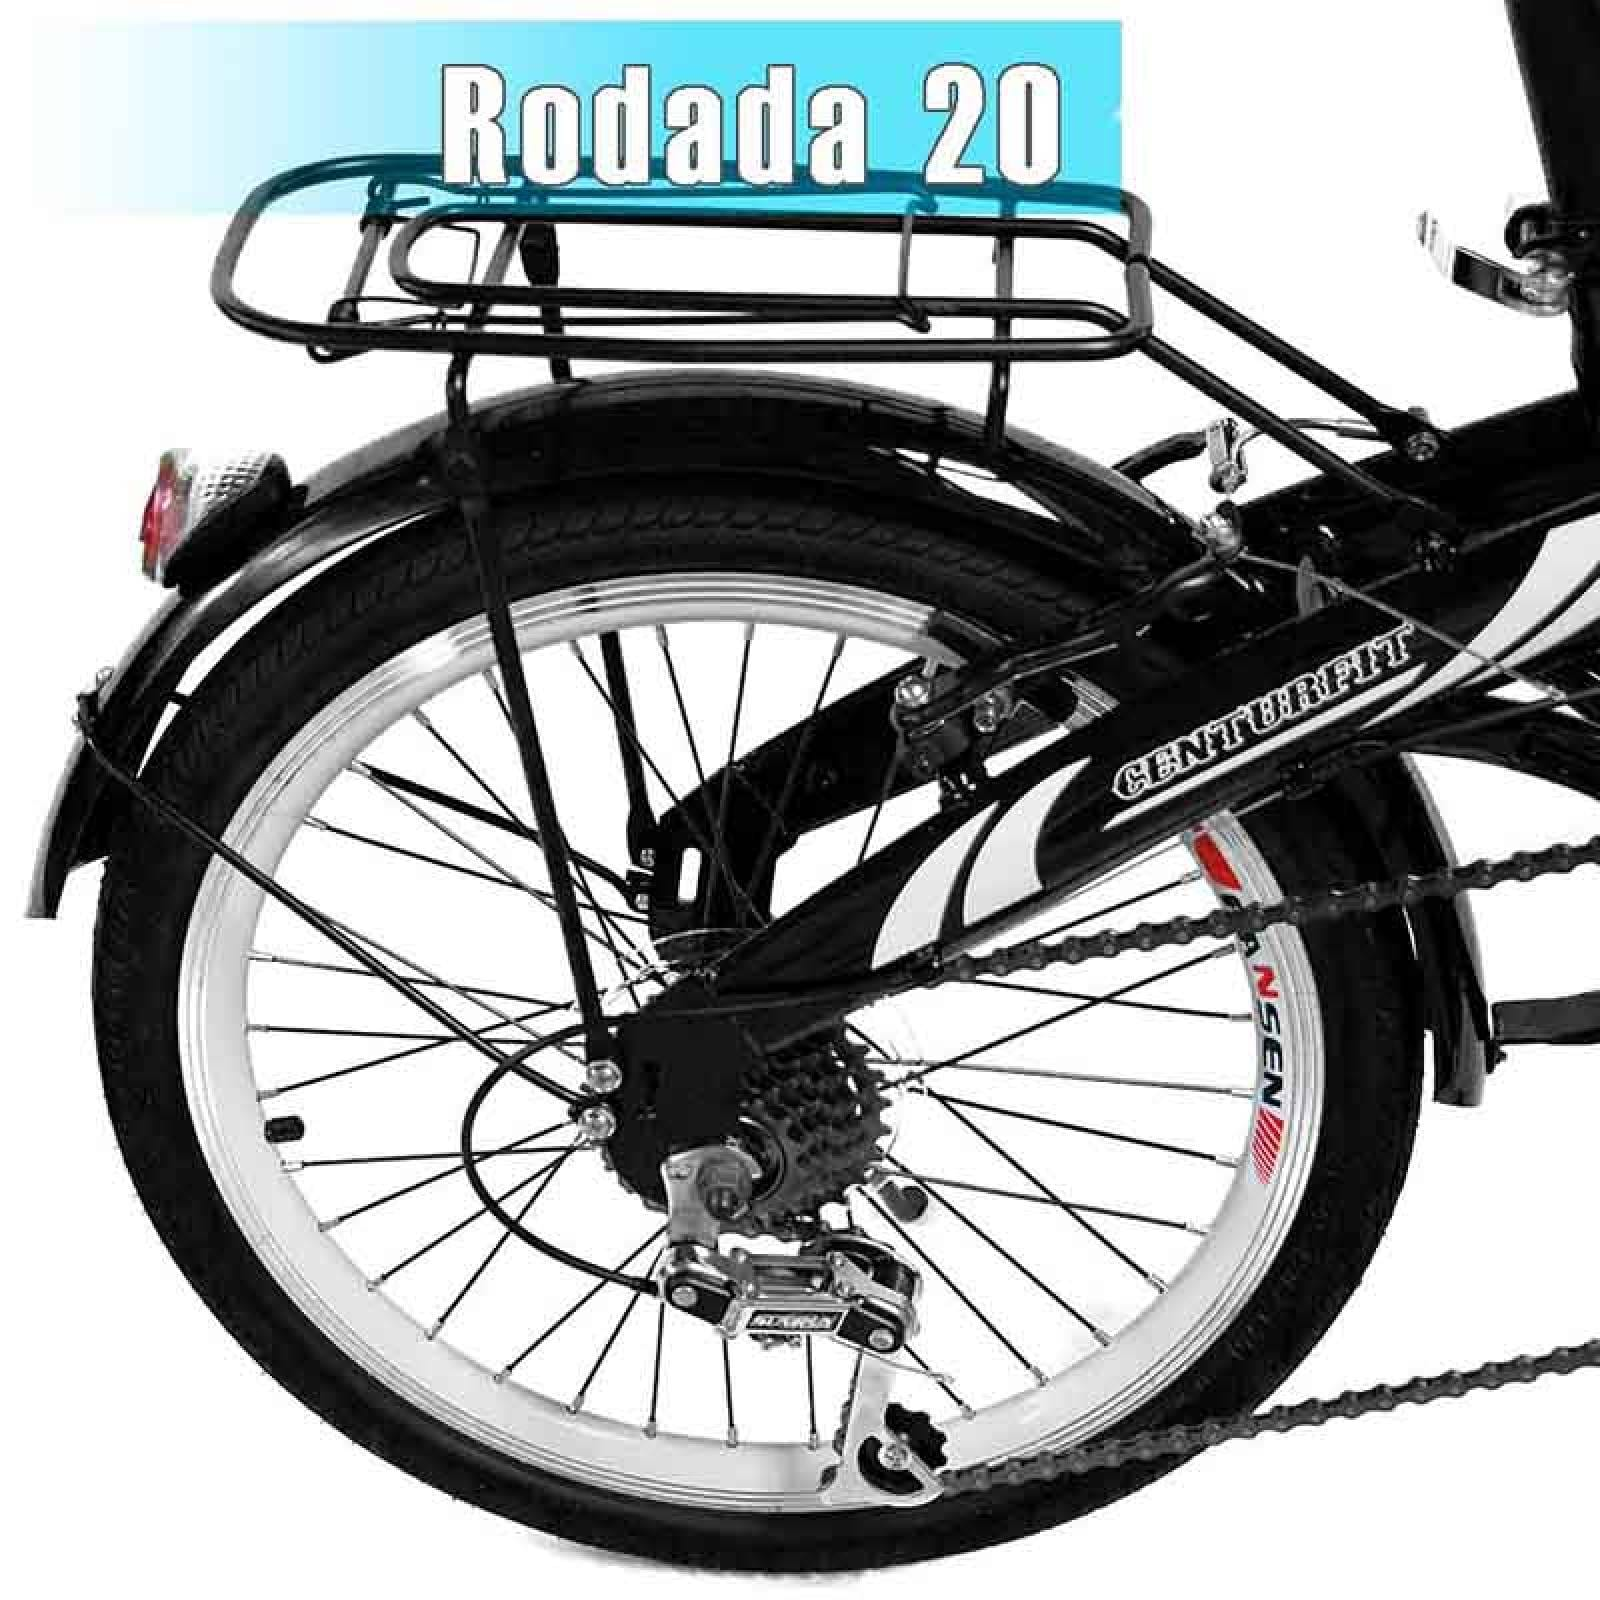 Bicicleta Plegable R20 Acero 7 Velocidades Freno Vbreak Portabultos Campana Negra